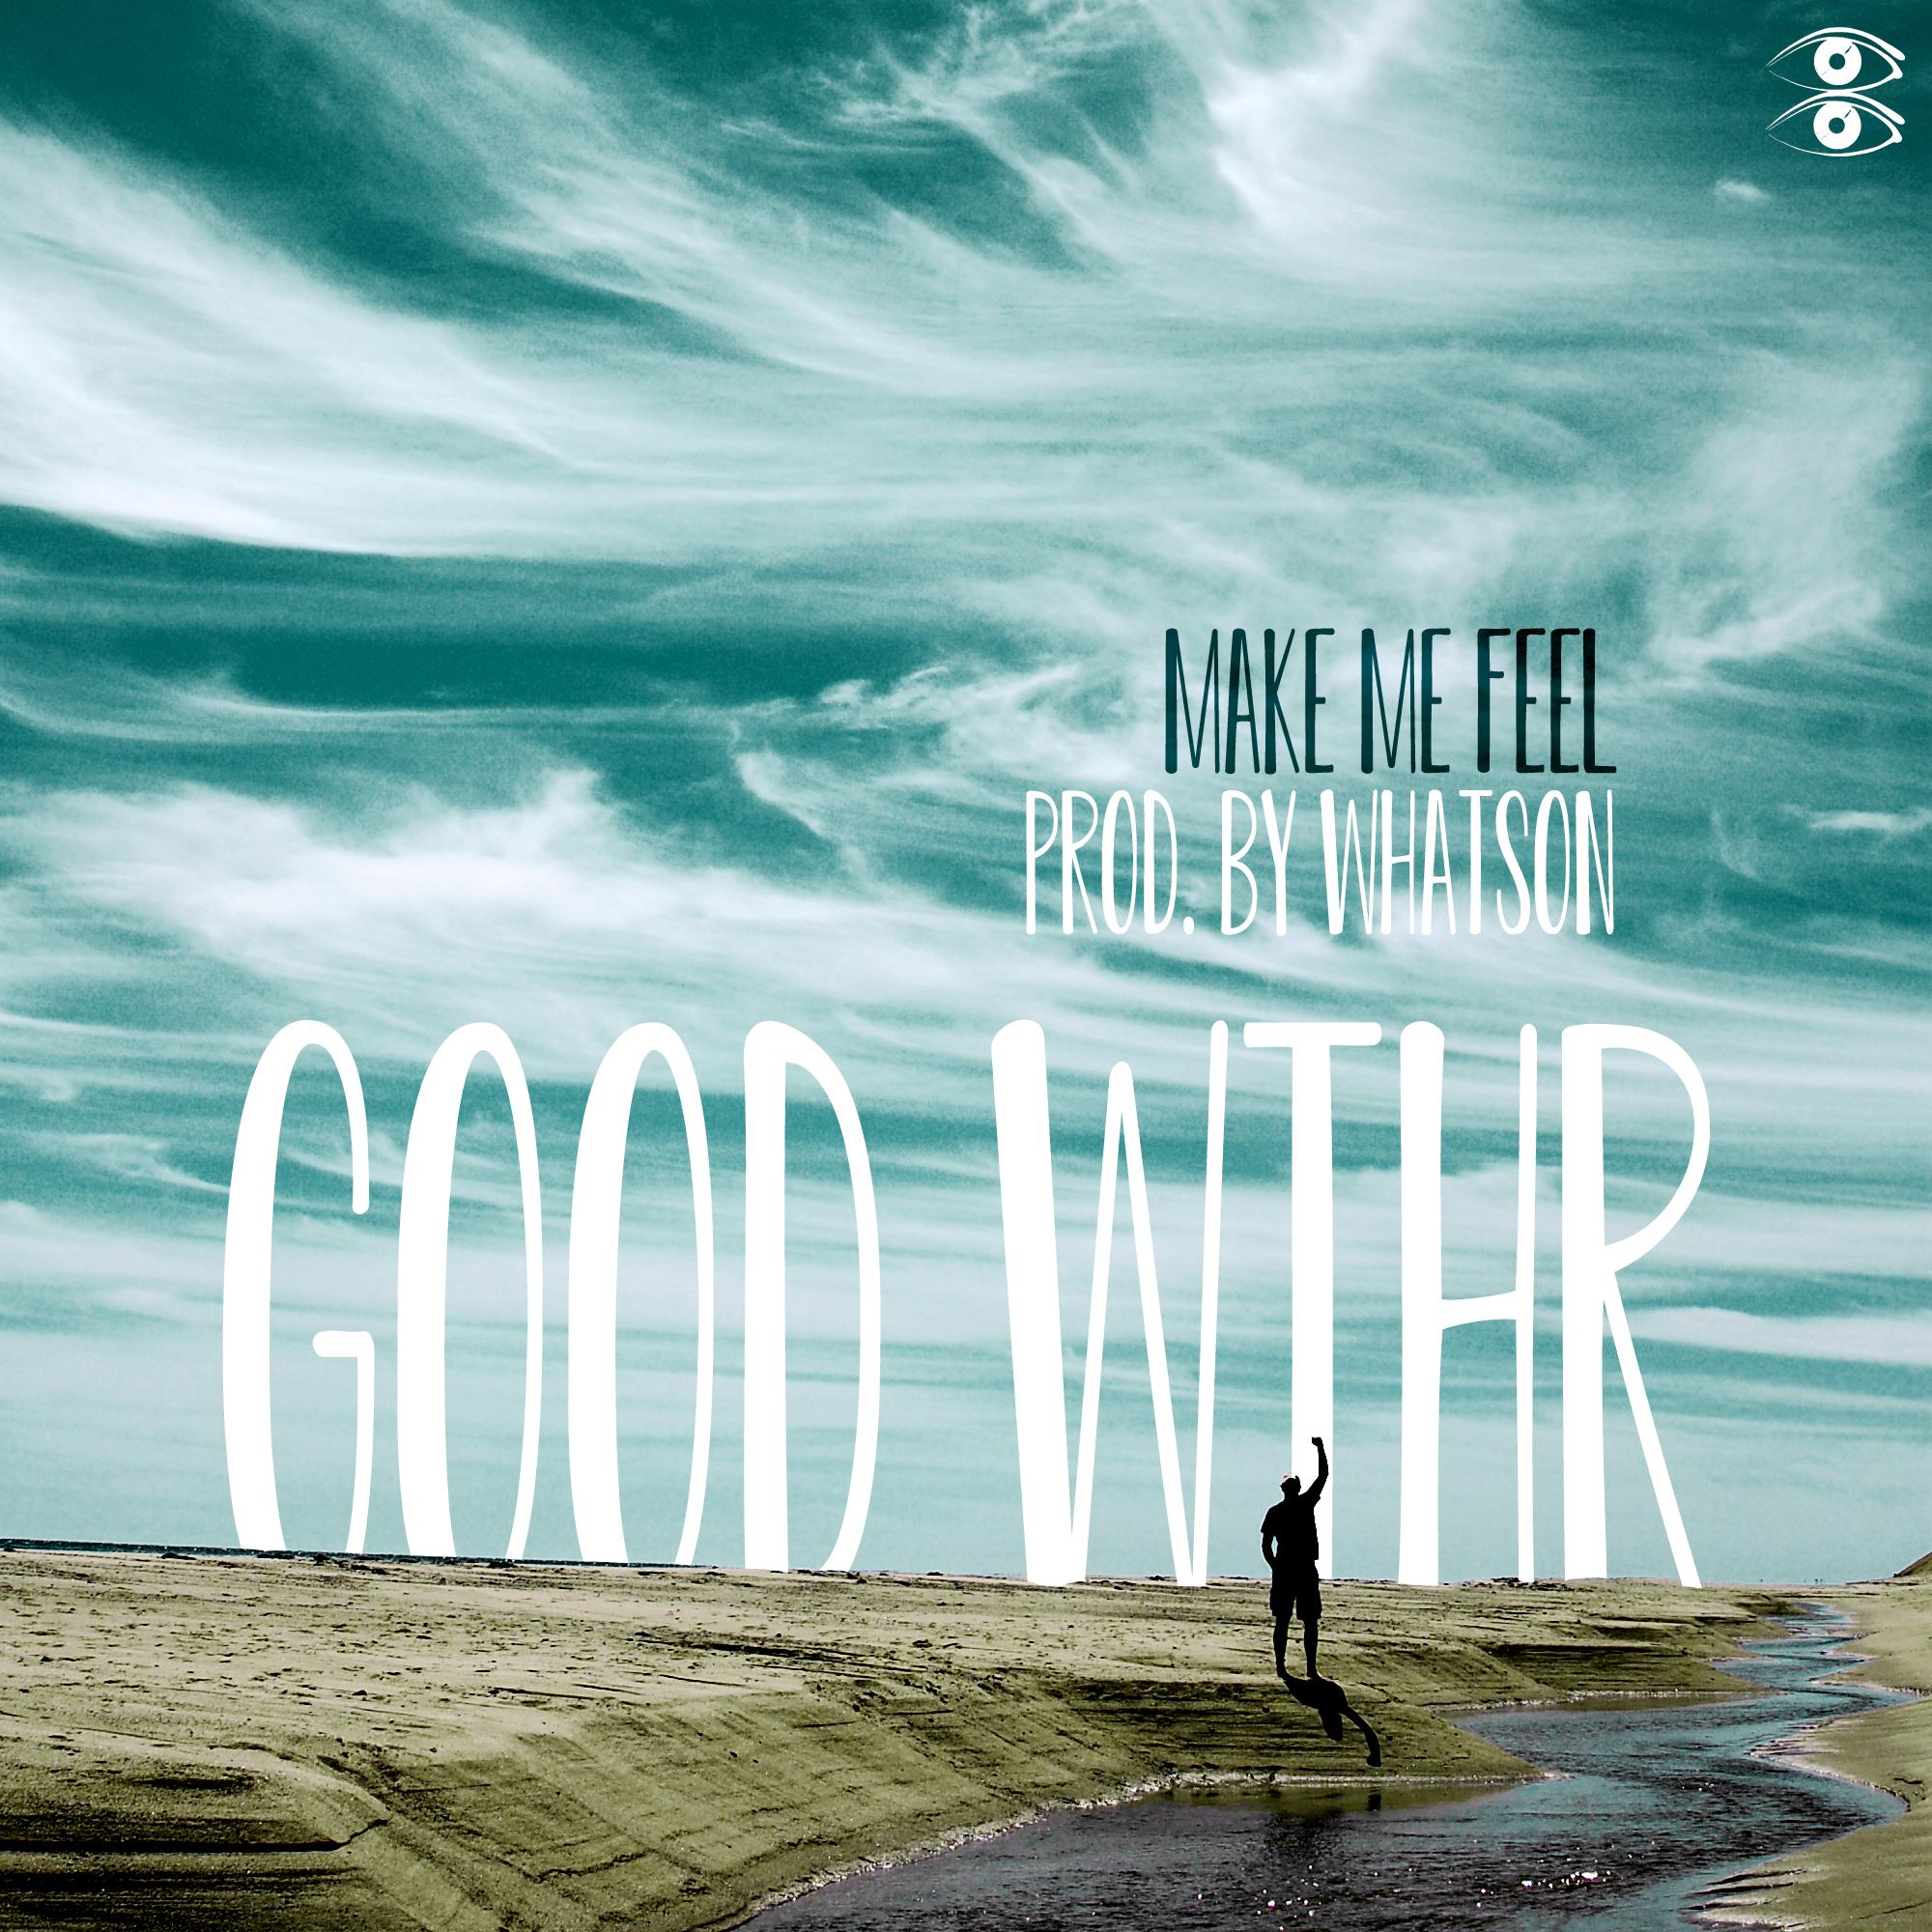 Make Me Feel - by GOOD WTHR